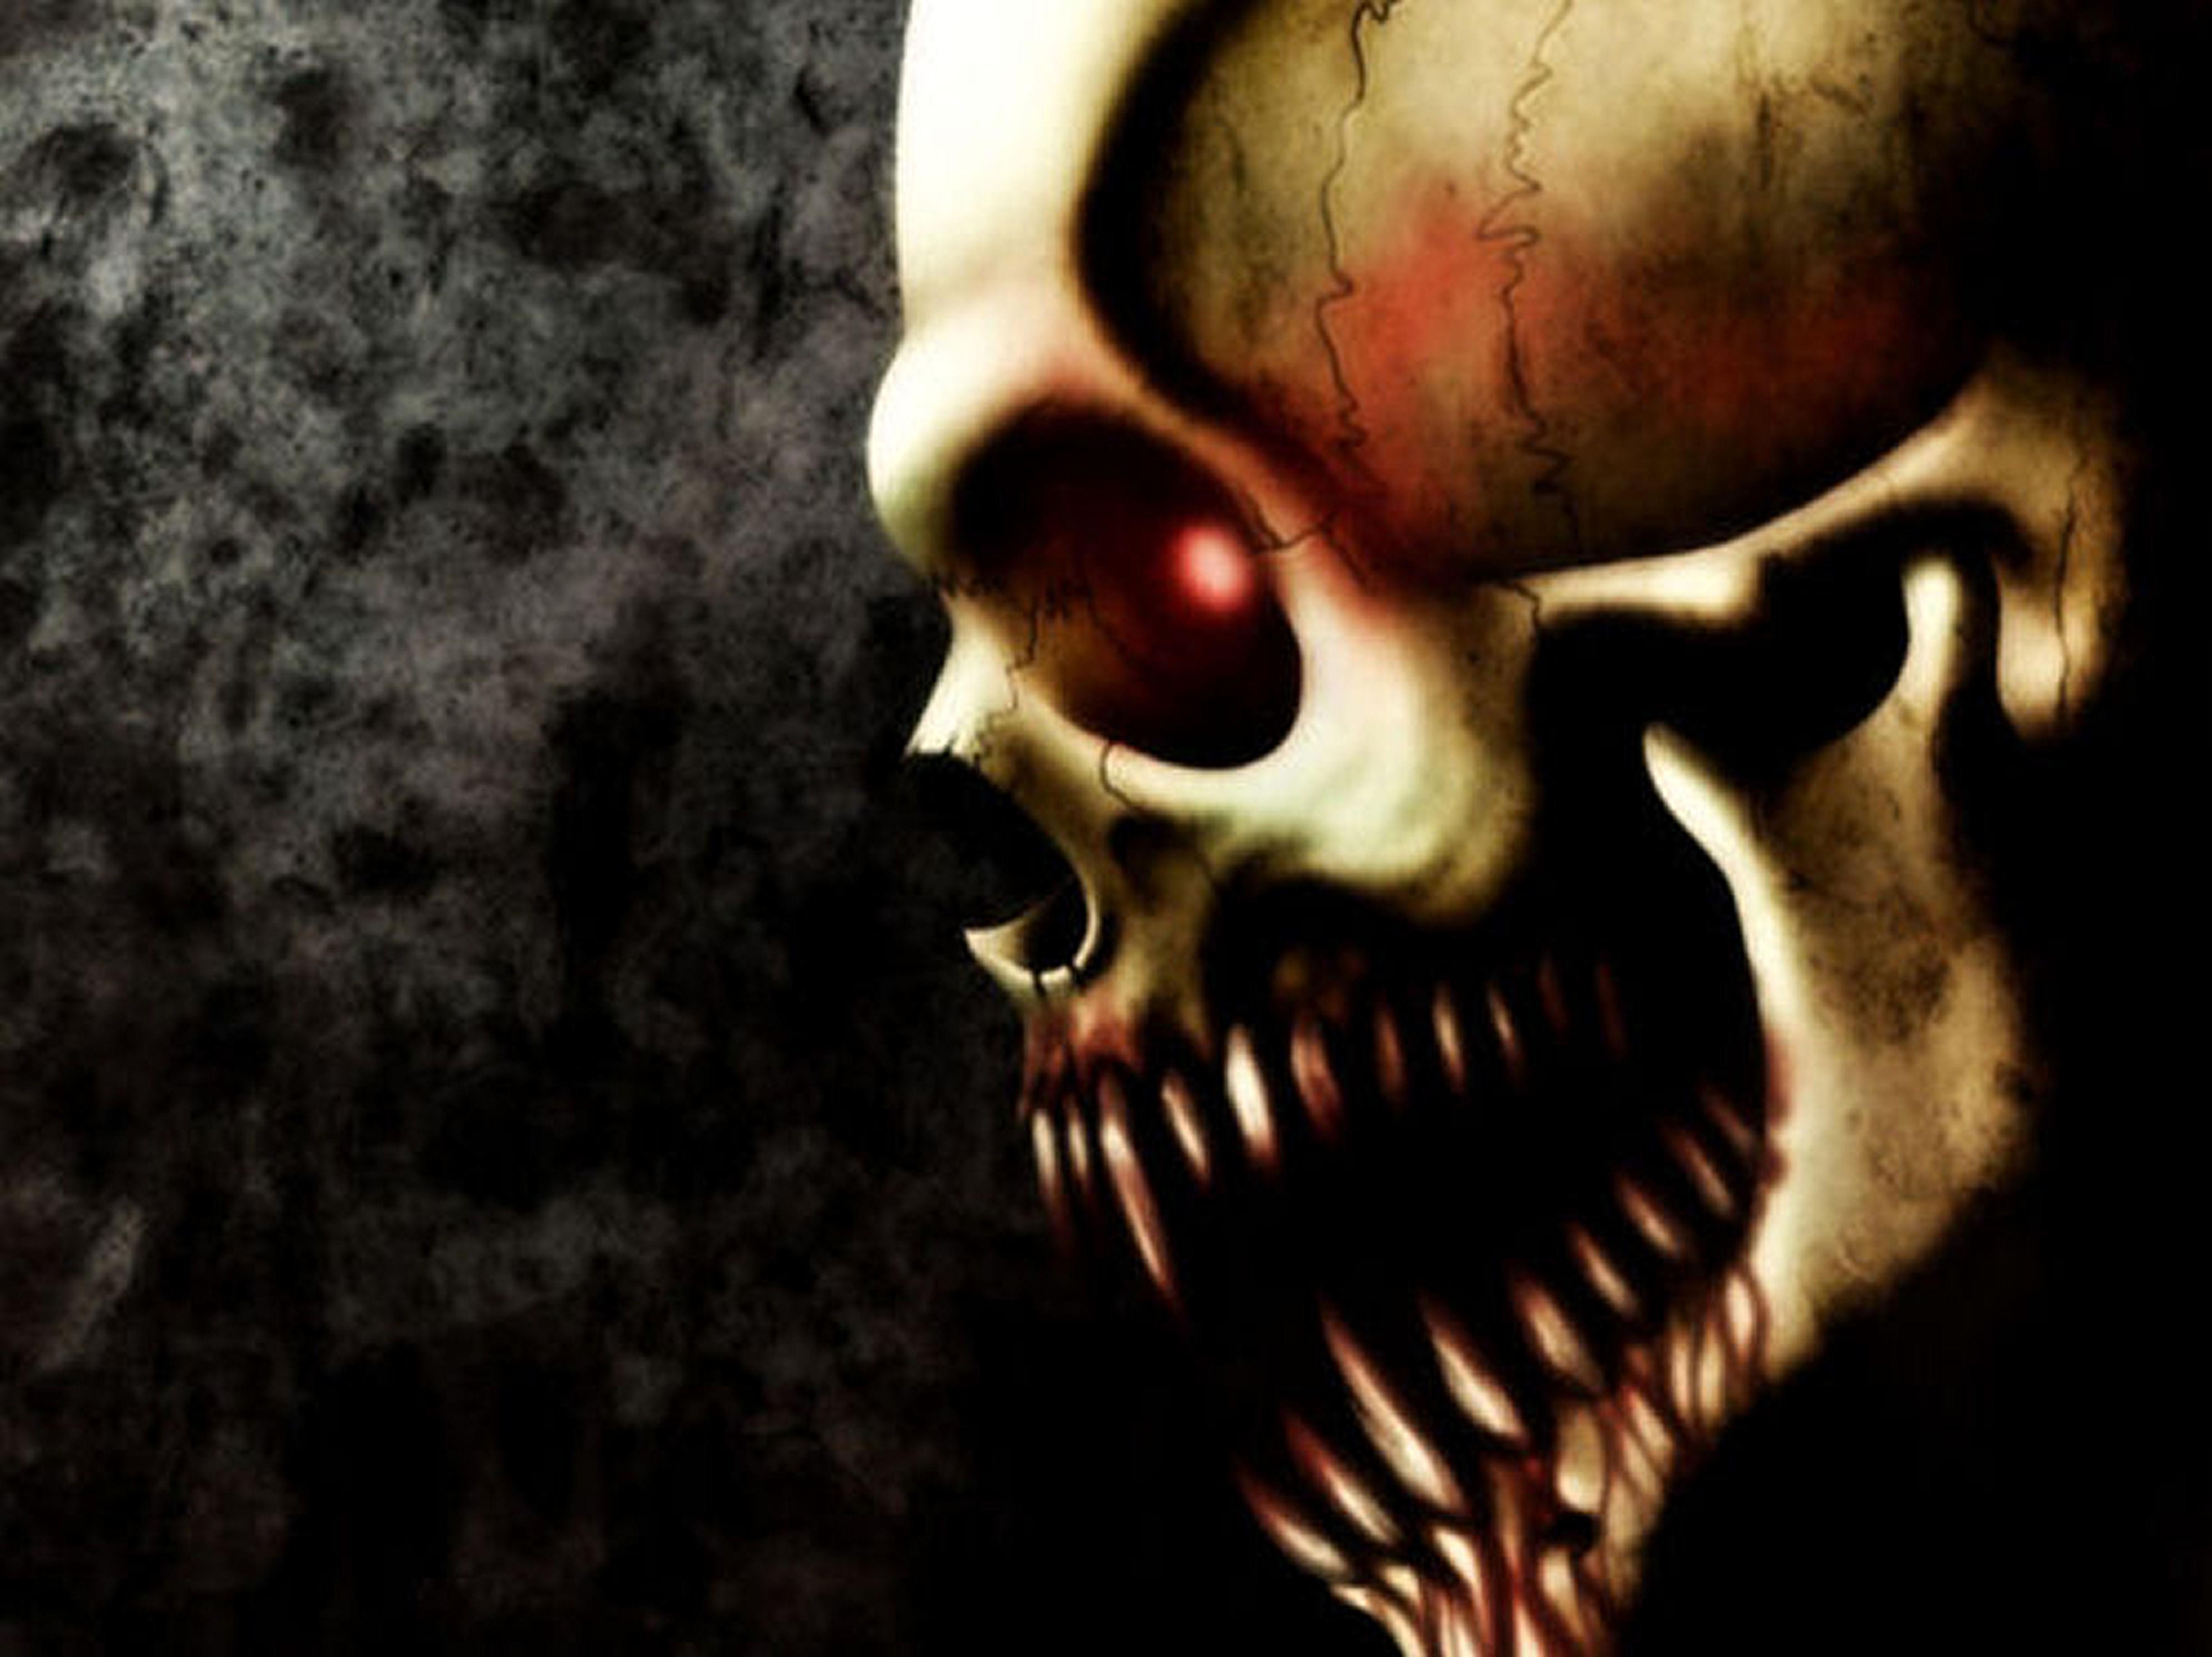 Scary skulls wallpaper wallpapersafari - Scary skull backgrounds ...